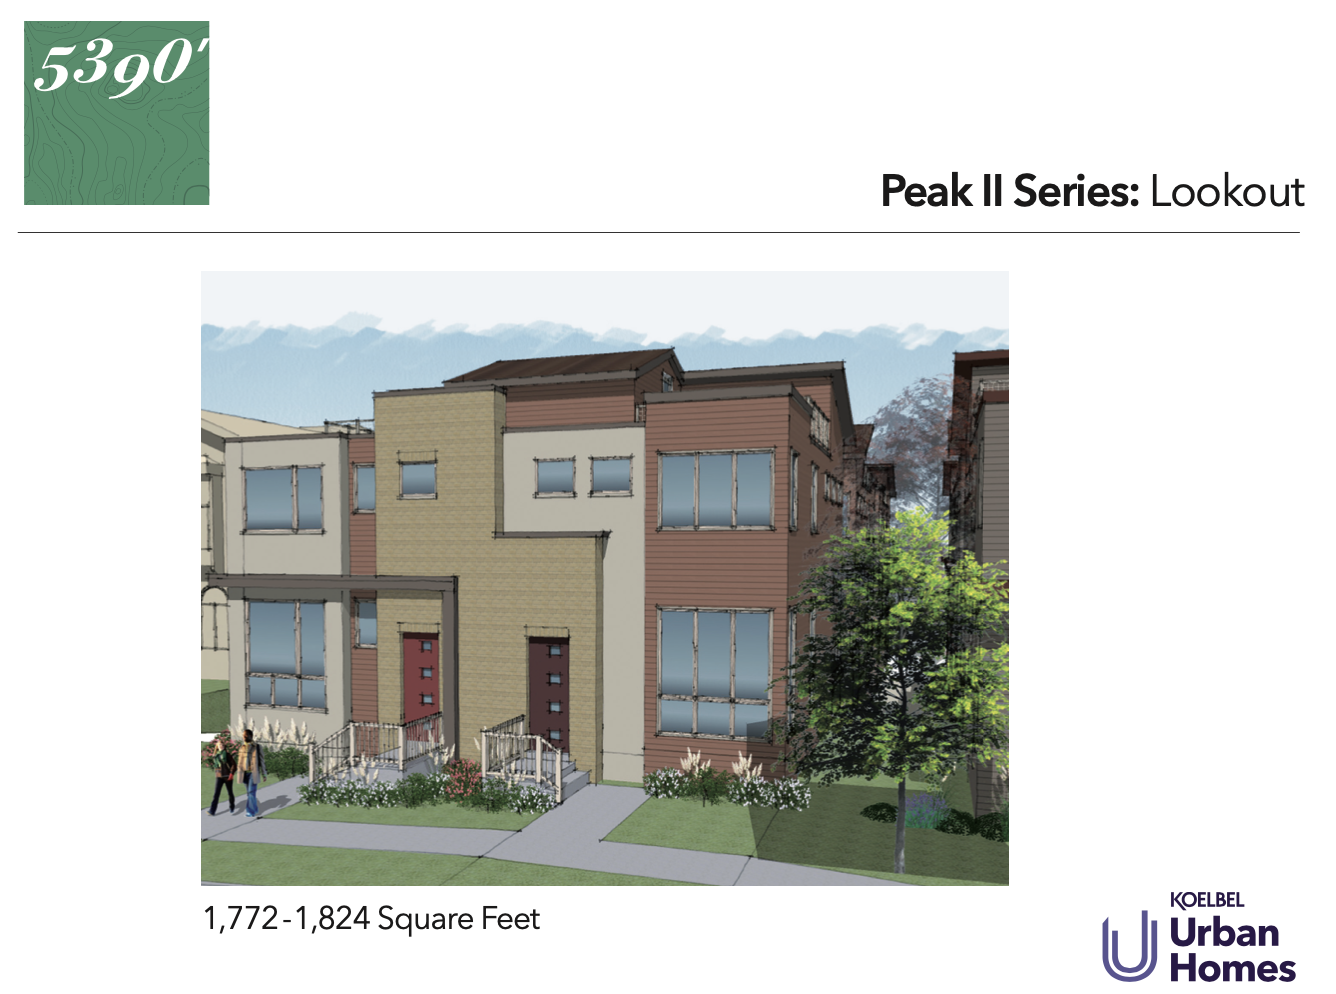 5390' Community by Koelbel in the Berkeley Tennyson Neighborhood Denver New Construction Homes For Sale Peak II Lookout Elevation